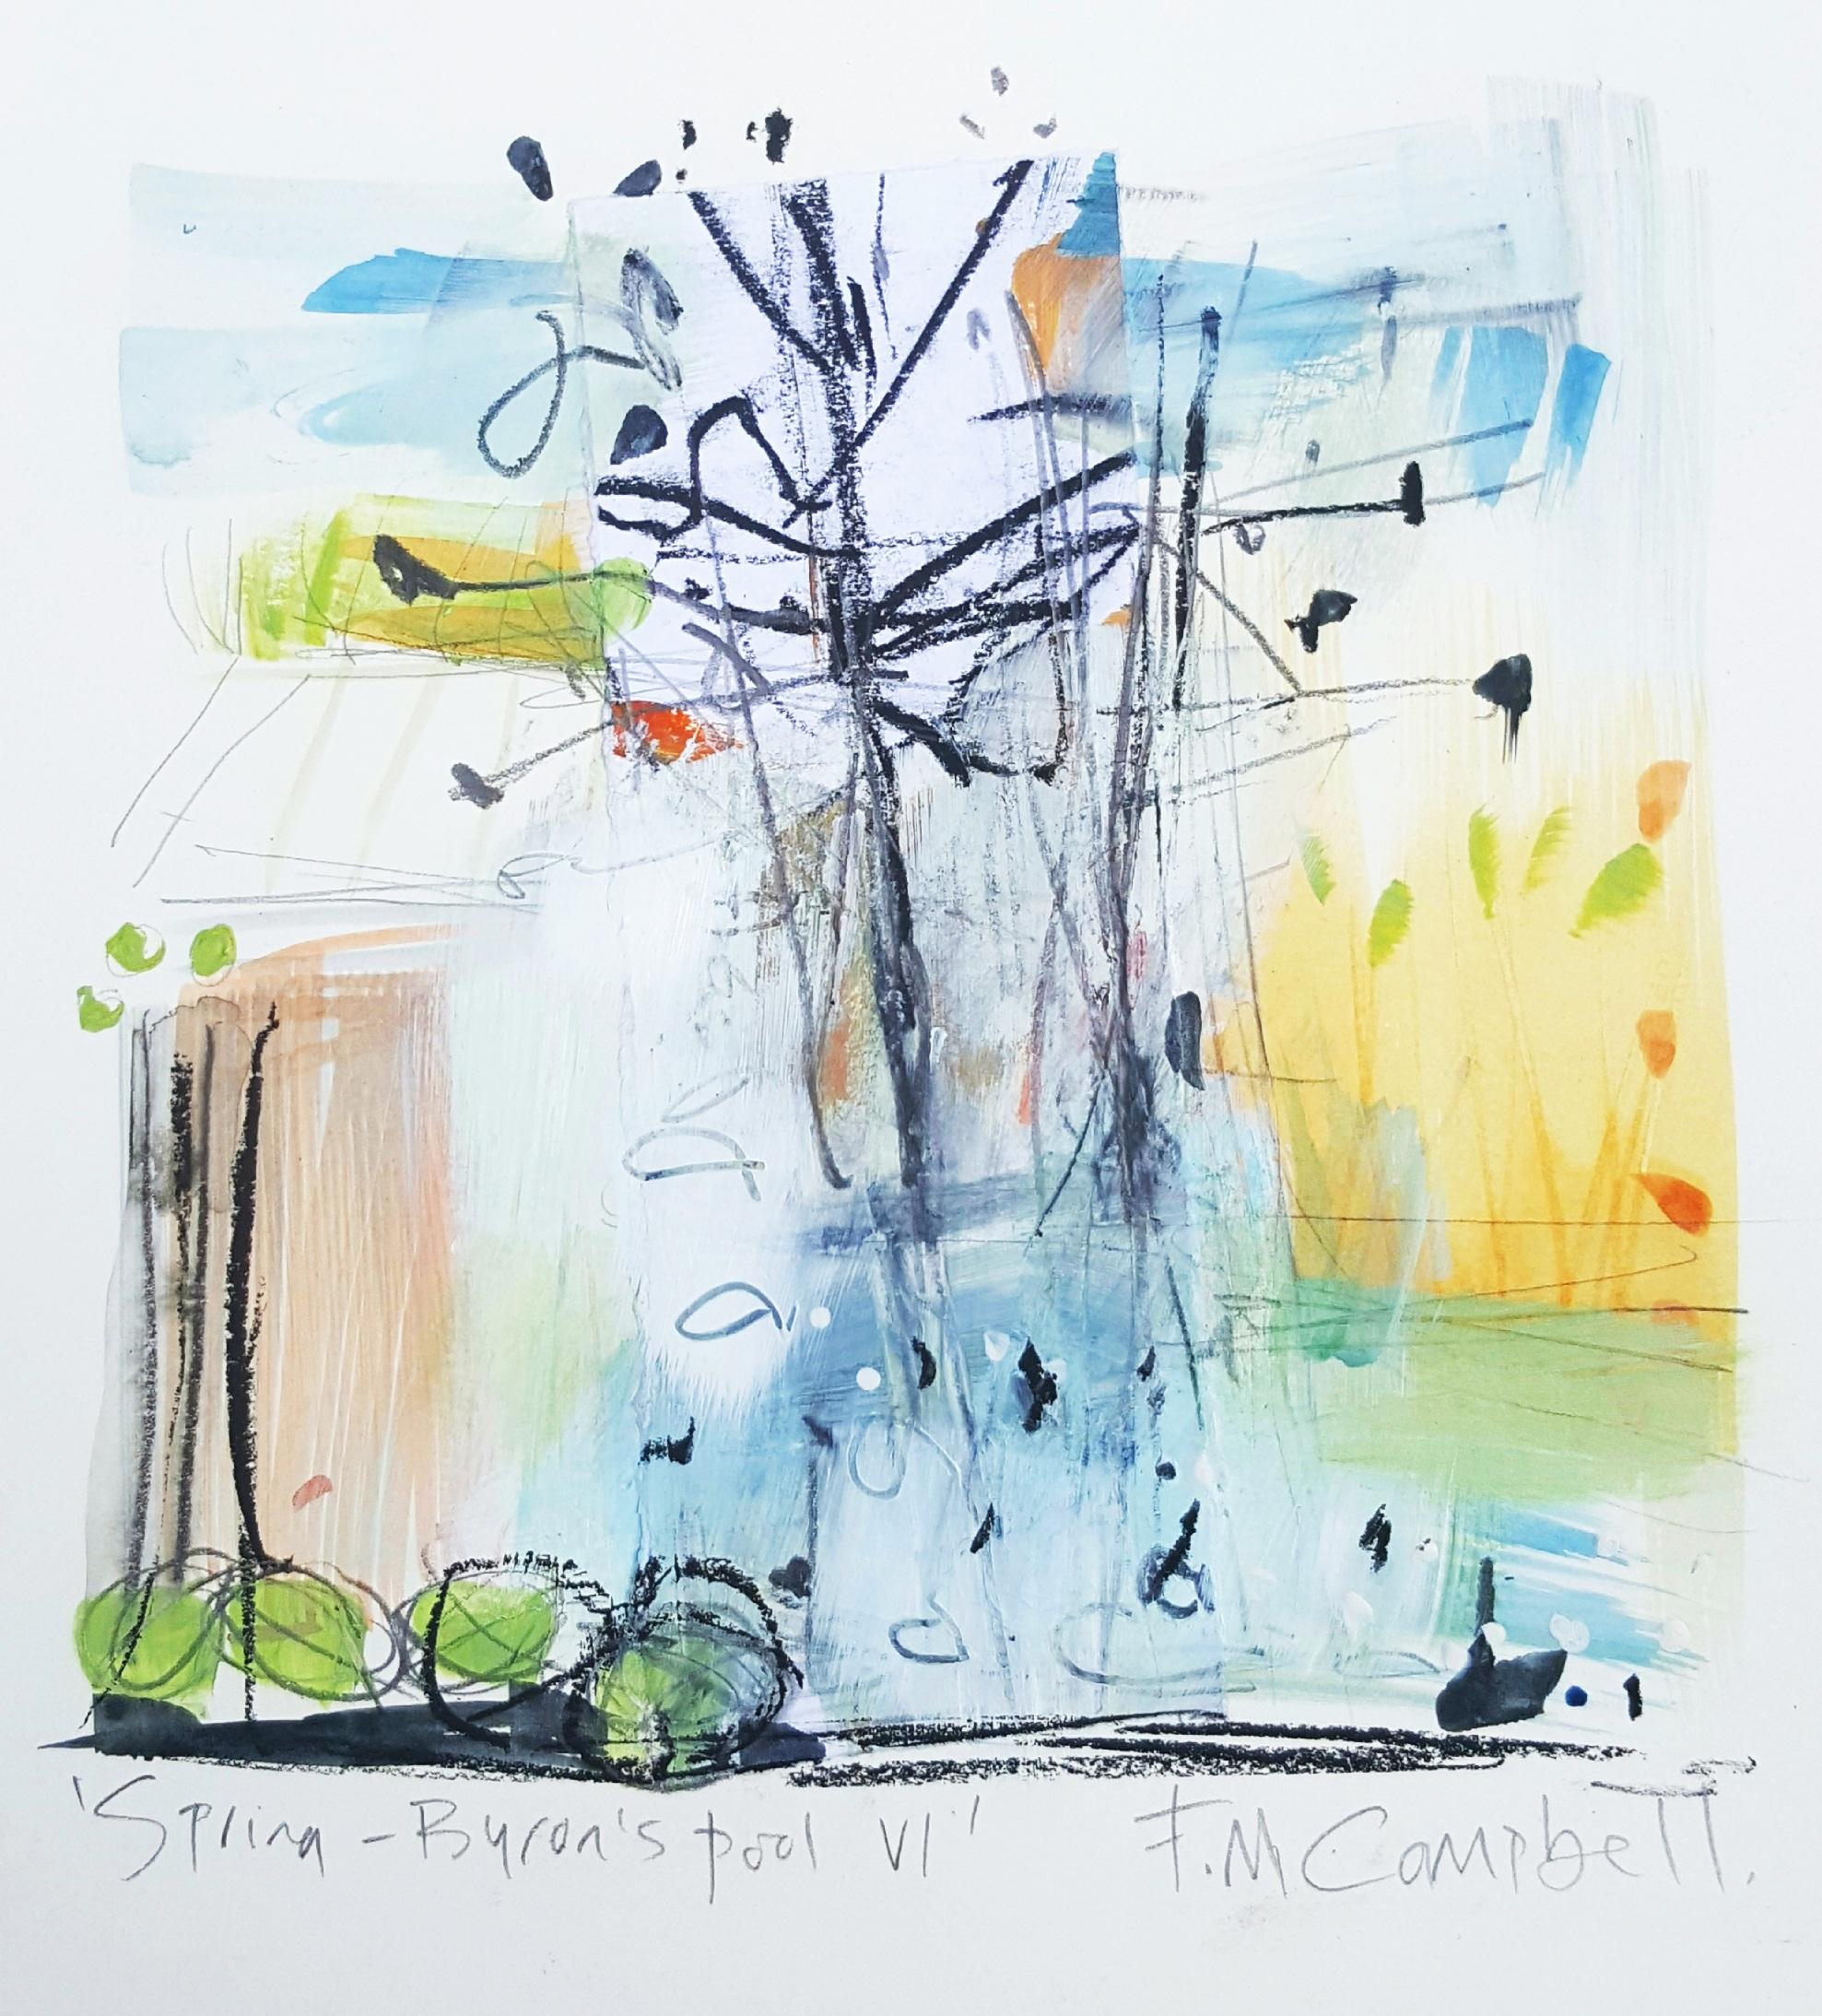 'Spring - Byron's Pool VI'